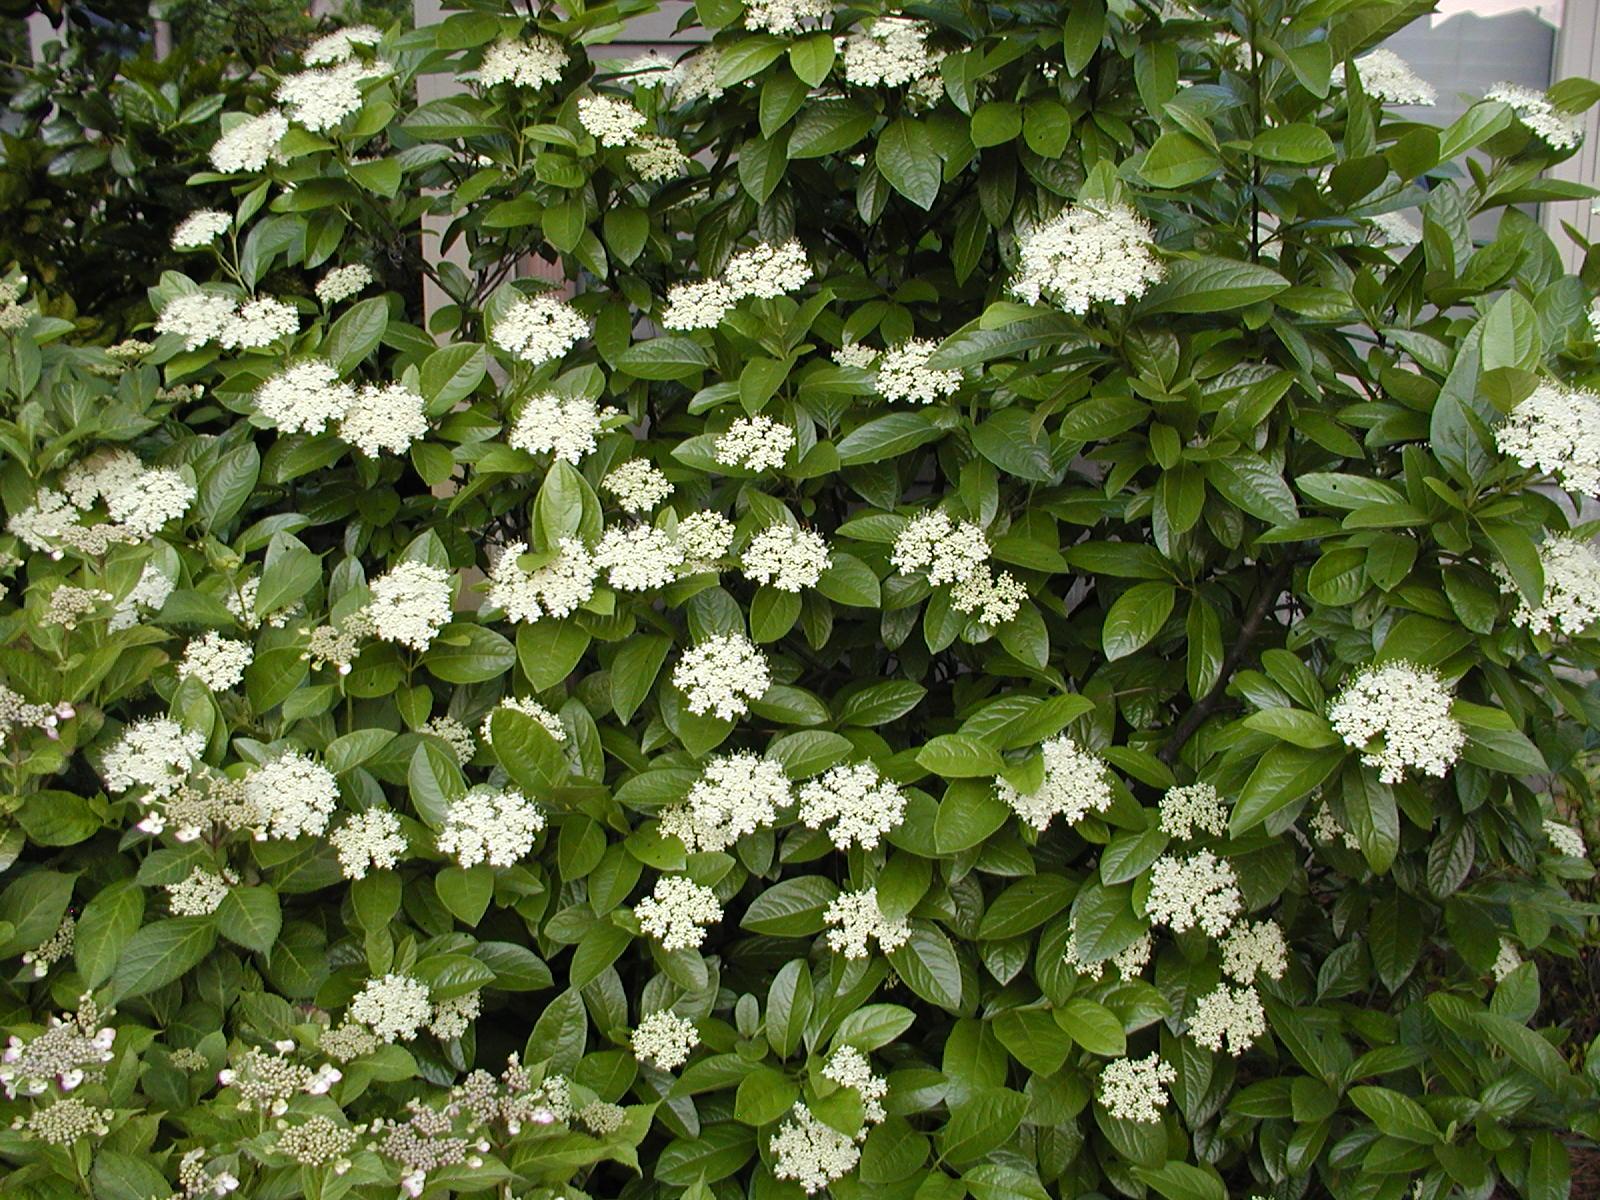 Gene's Garden: Perfect Spring Weather